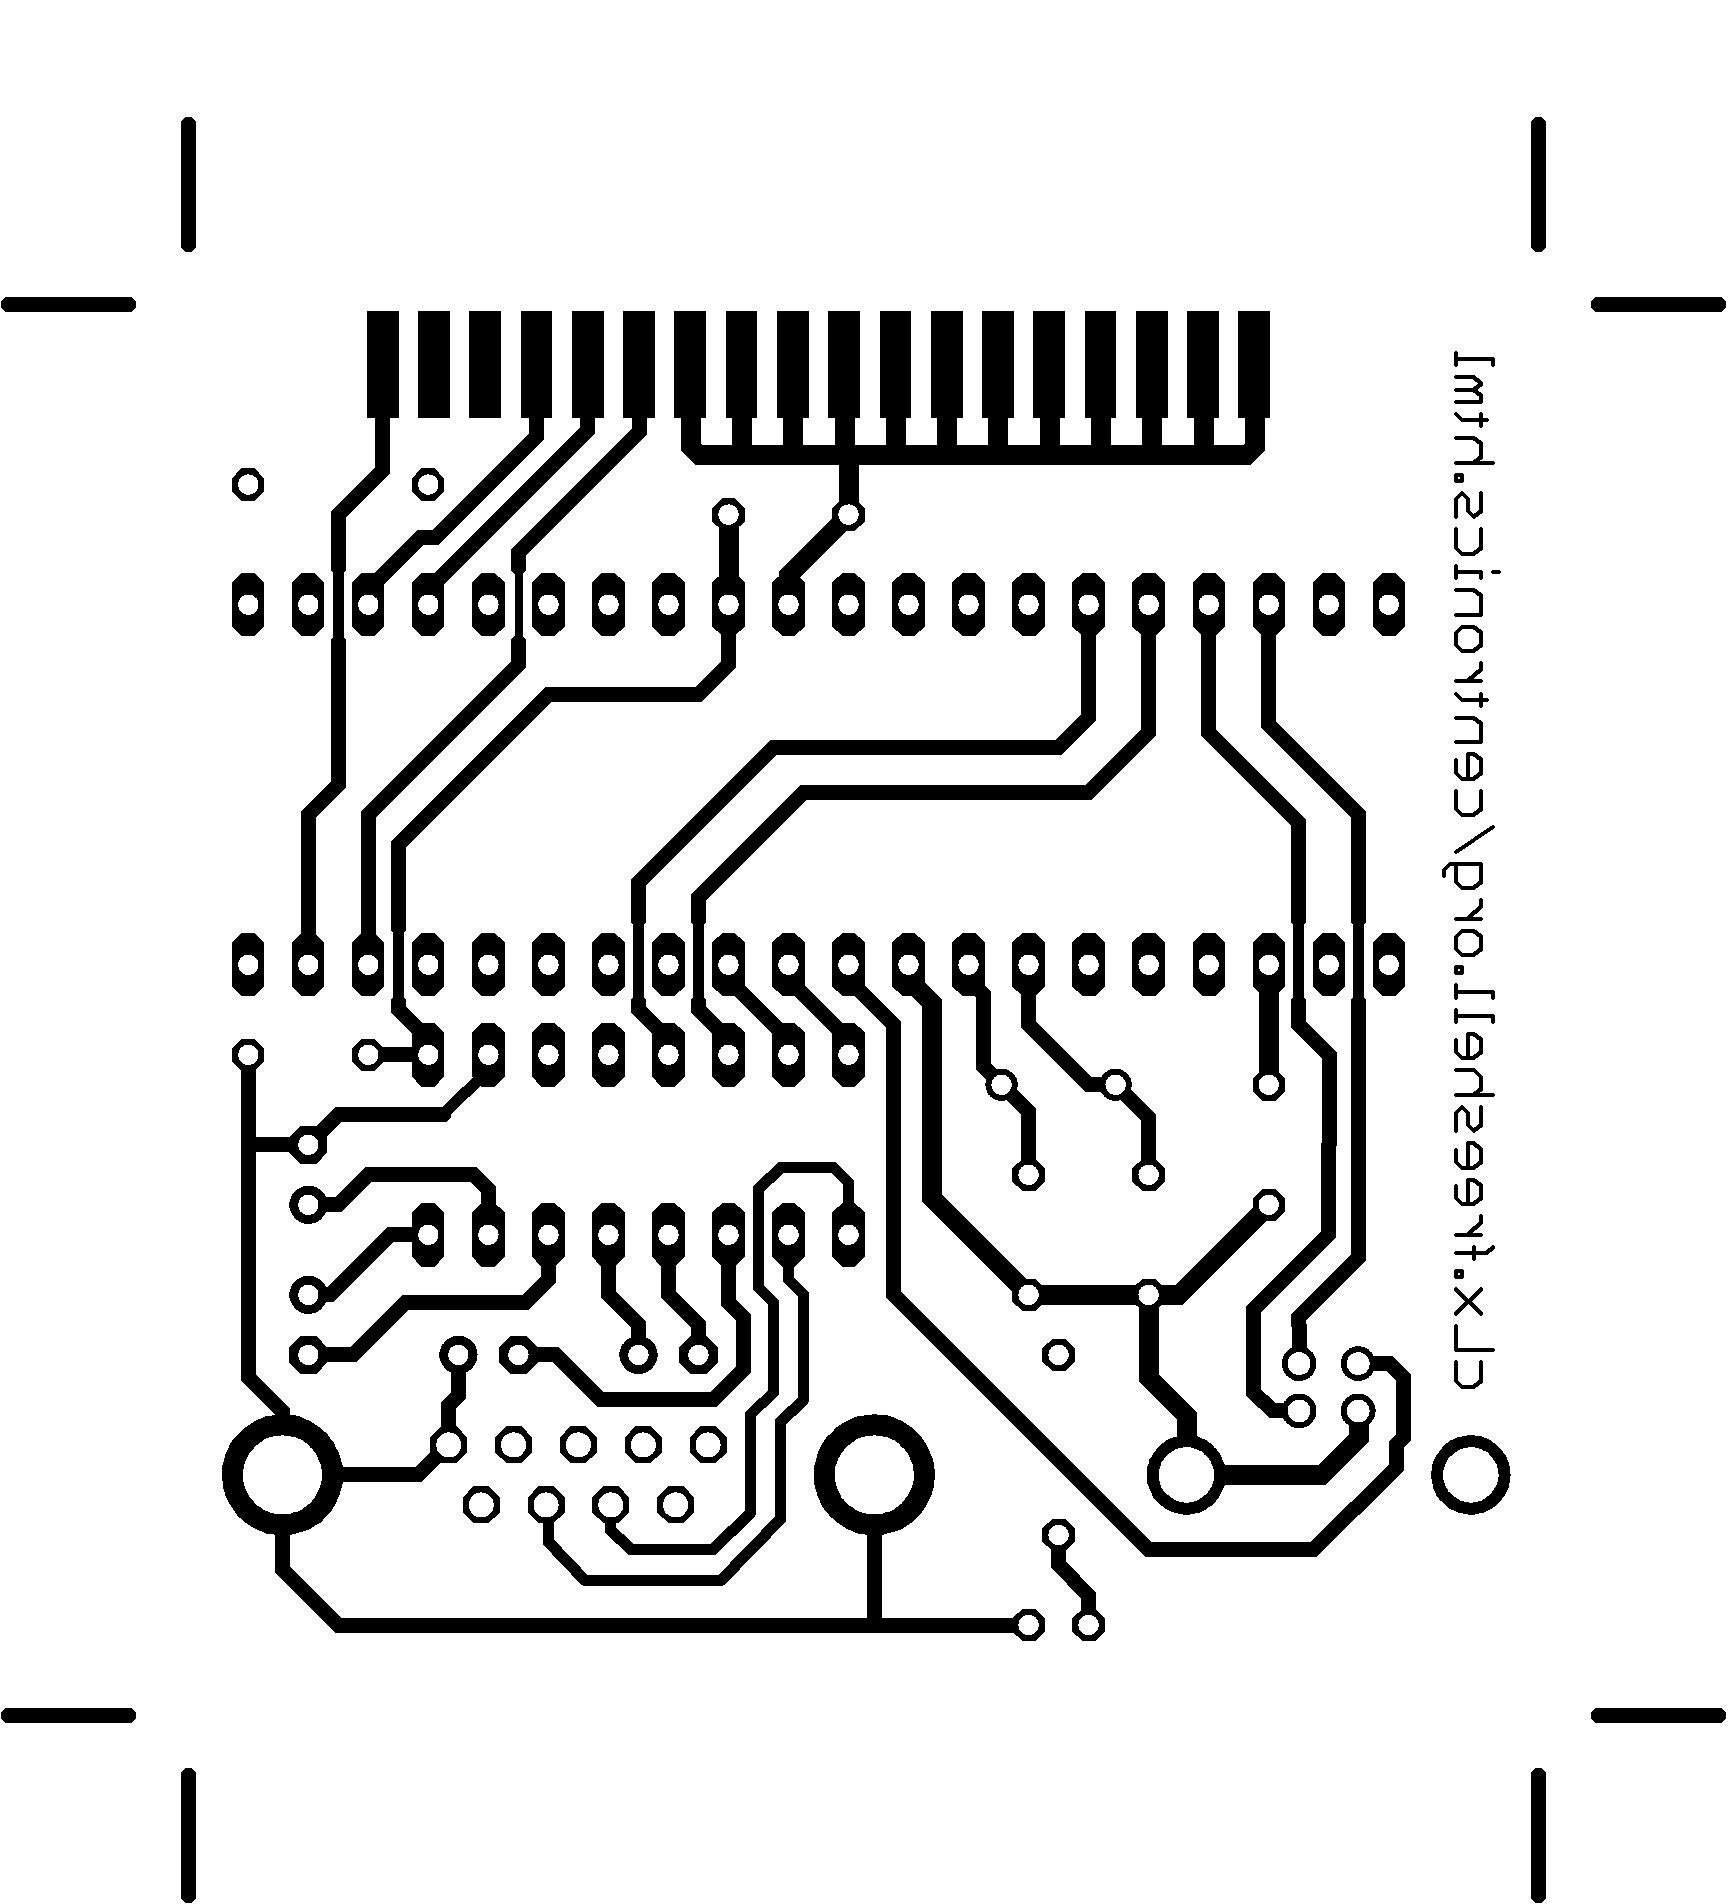 cLx freeshell org - Adaptateur USB/RS232 -> Centronics pour